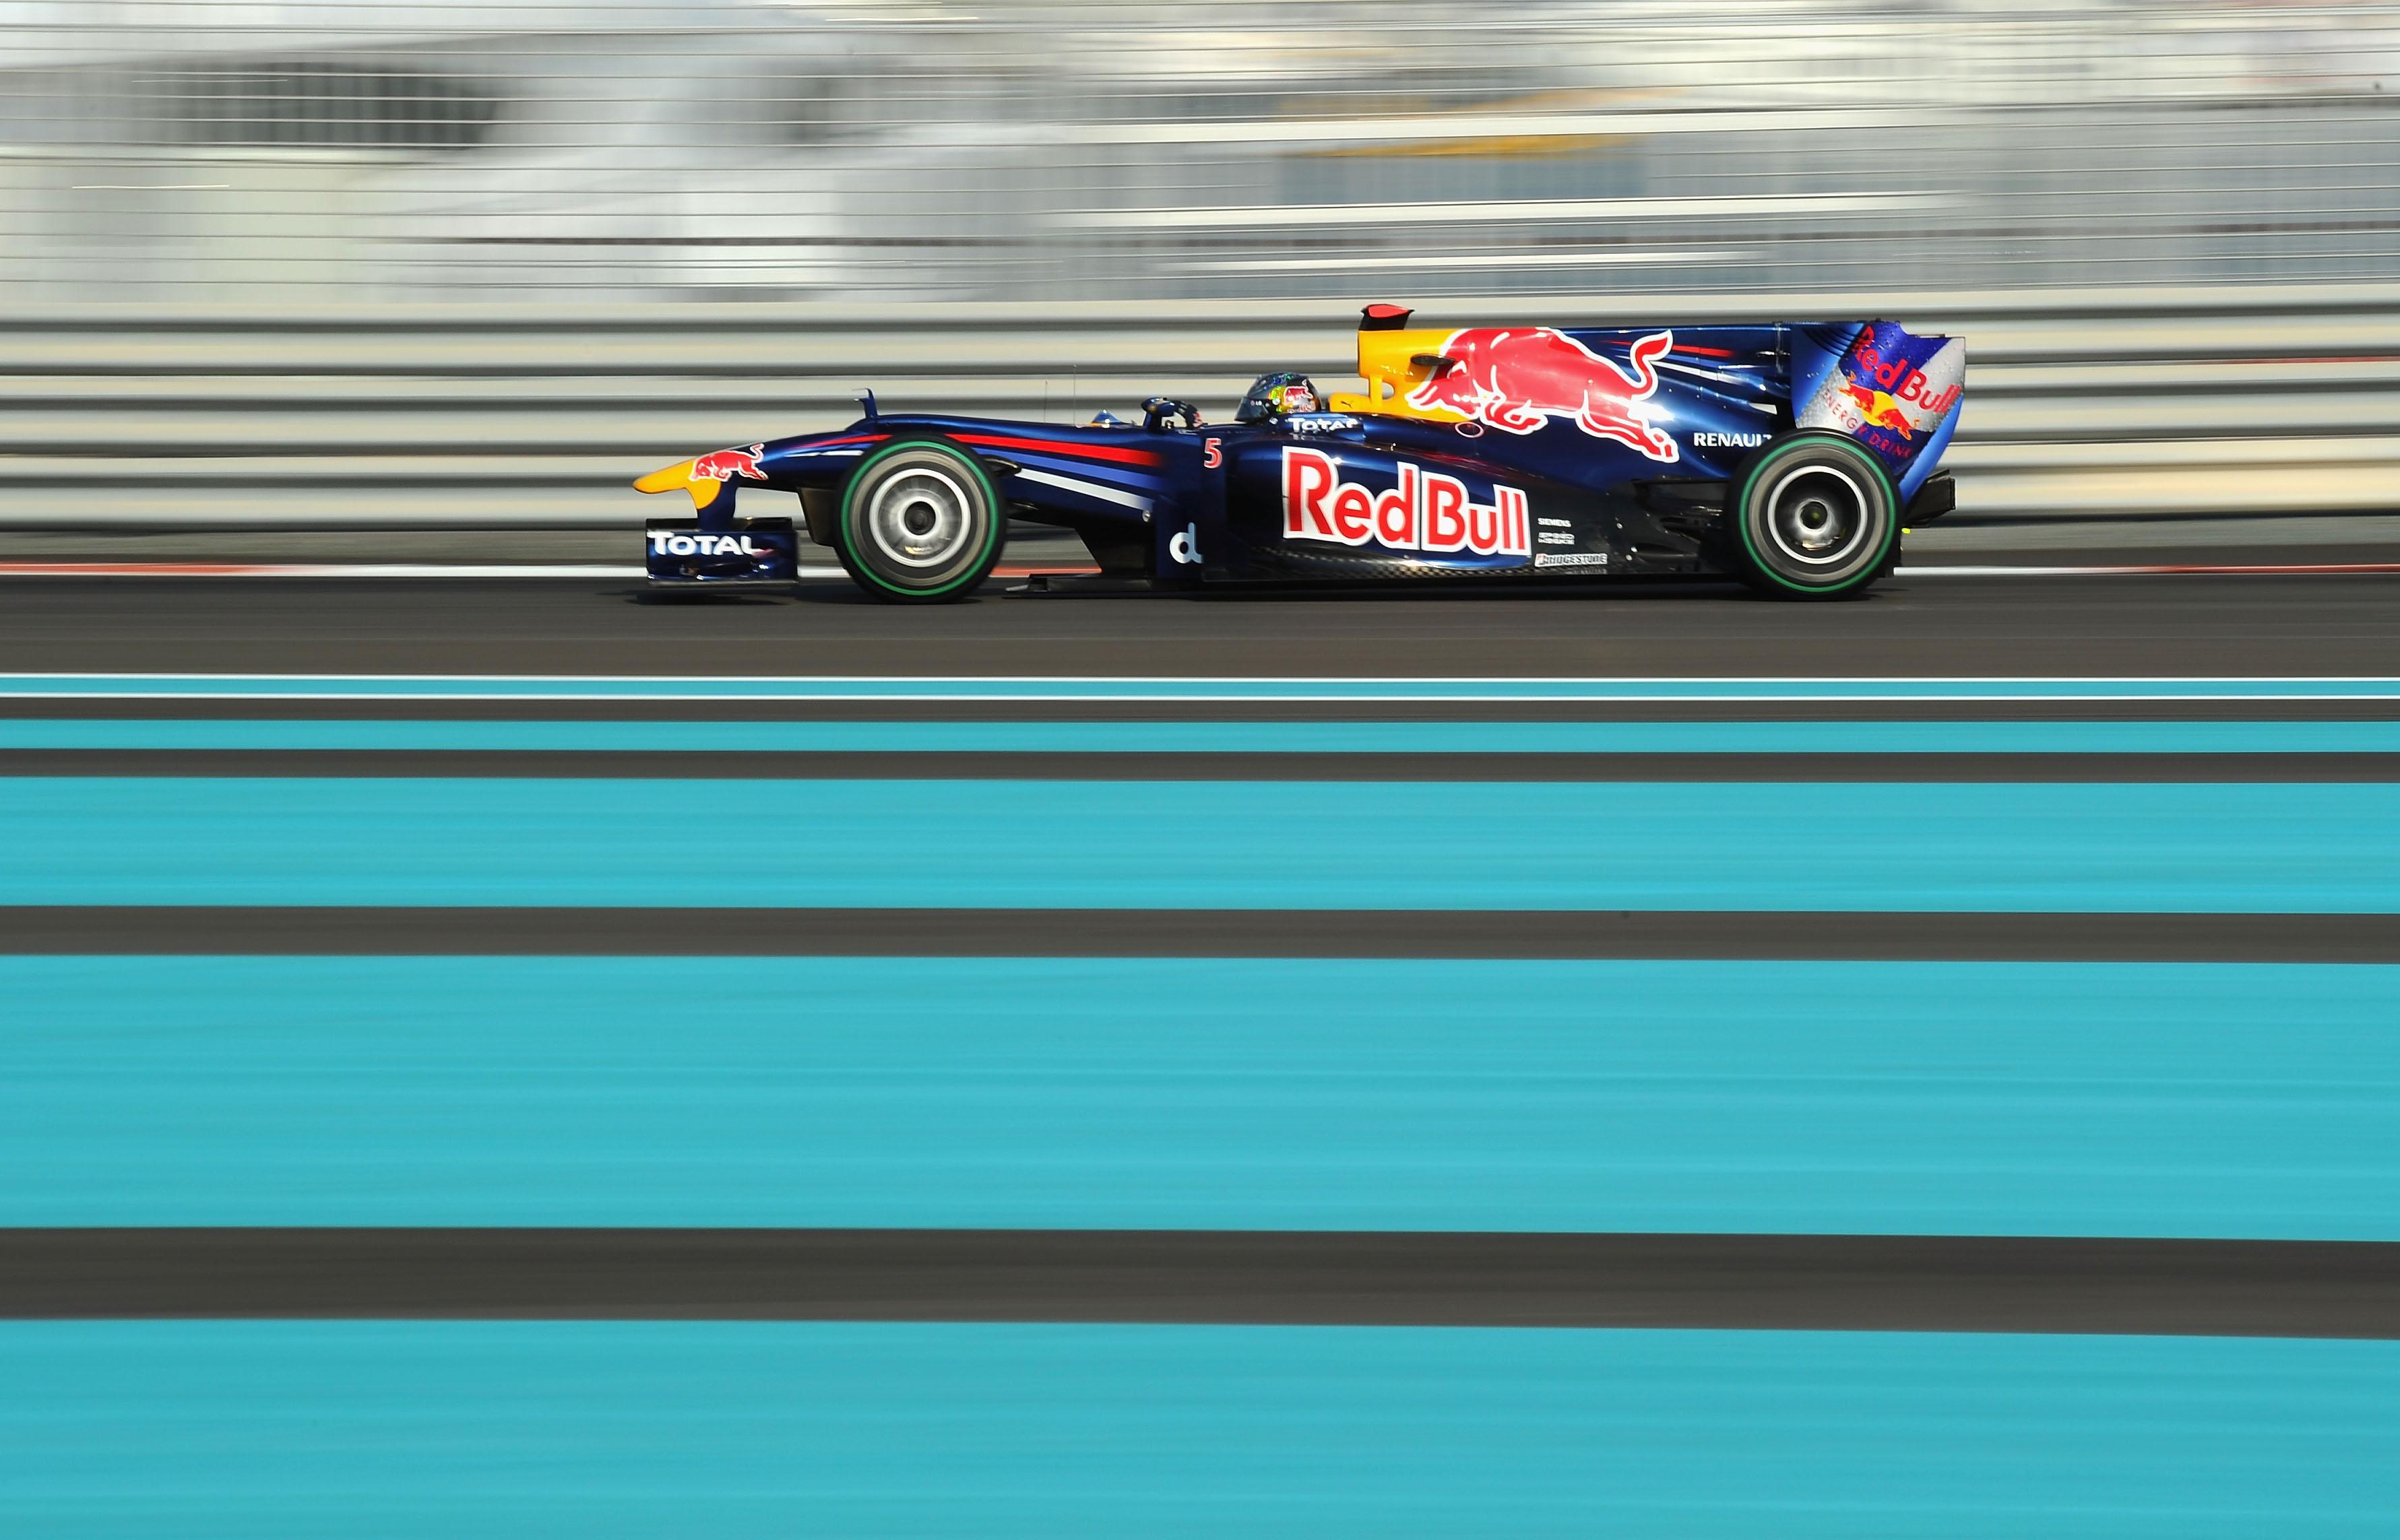 Formula 1: Vettel crowned youngest ever F1 Champion in Etihad Abu Dhabi Grand Prix showdown